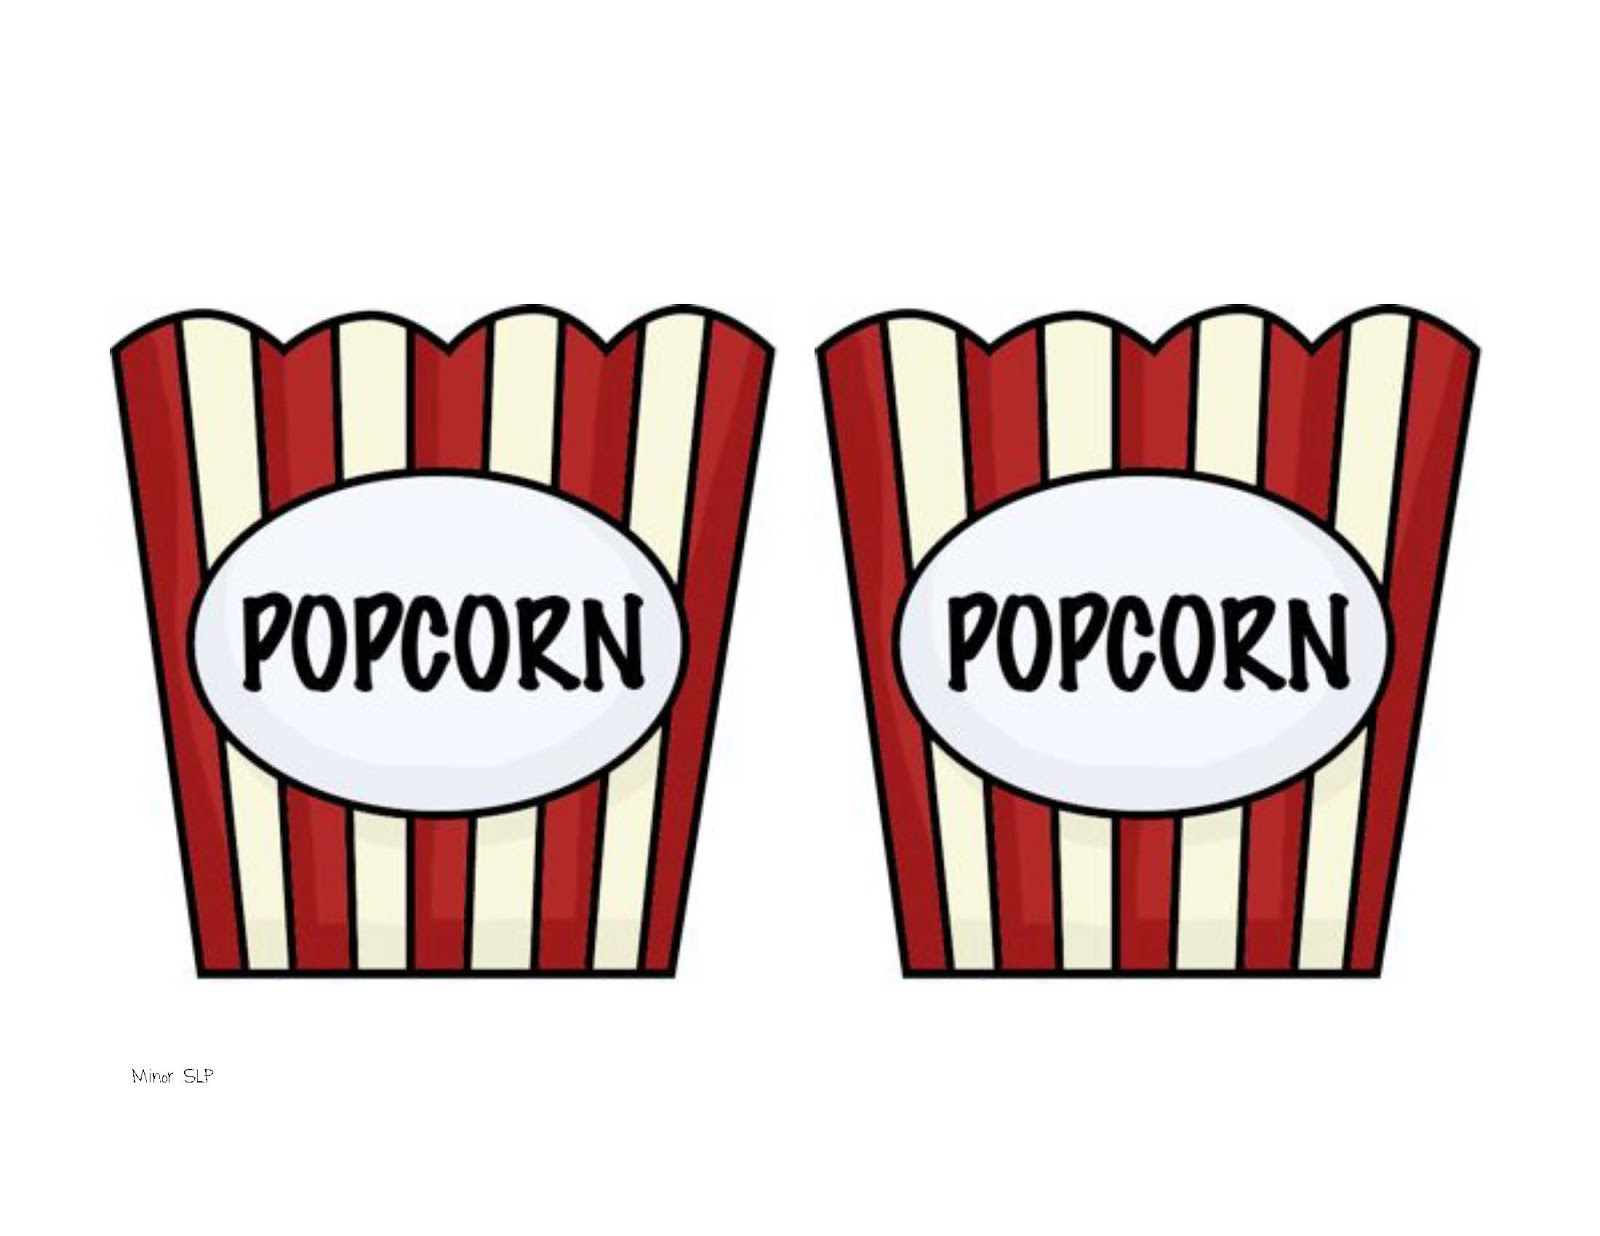 Templates  clipart popcorn On Images best Print Popcorn